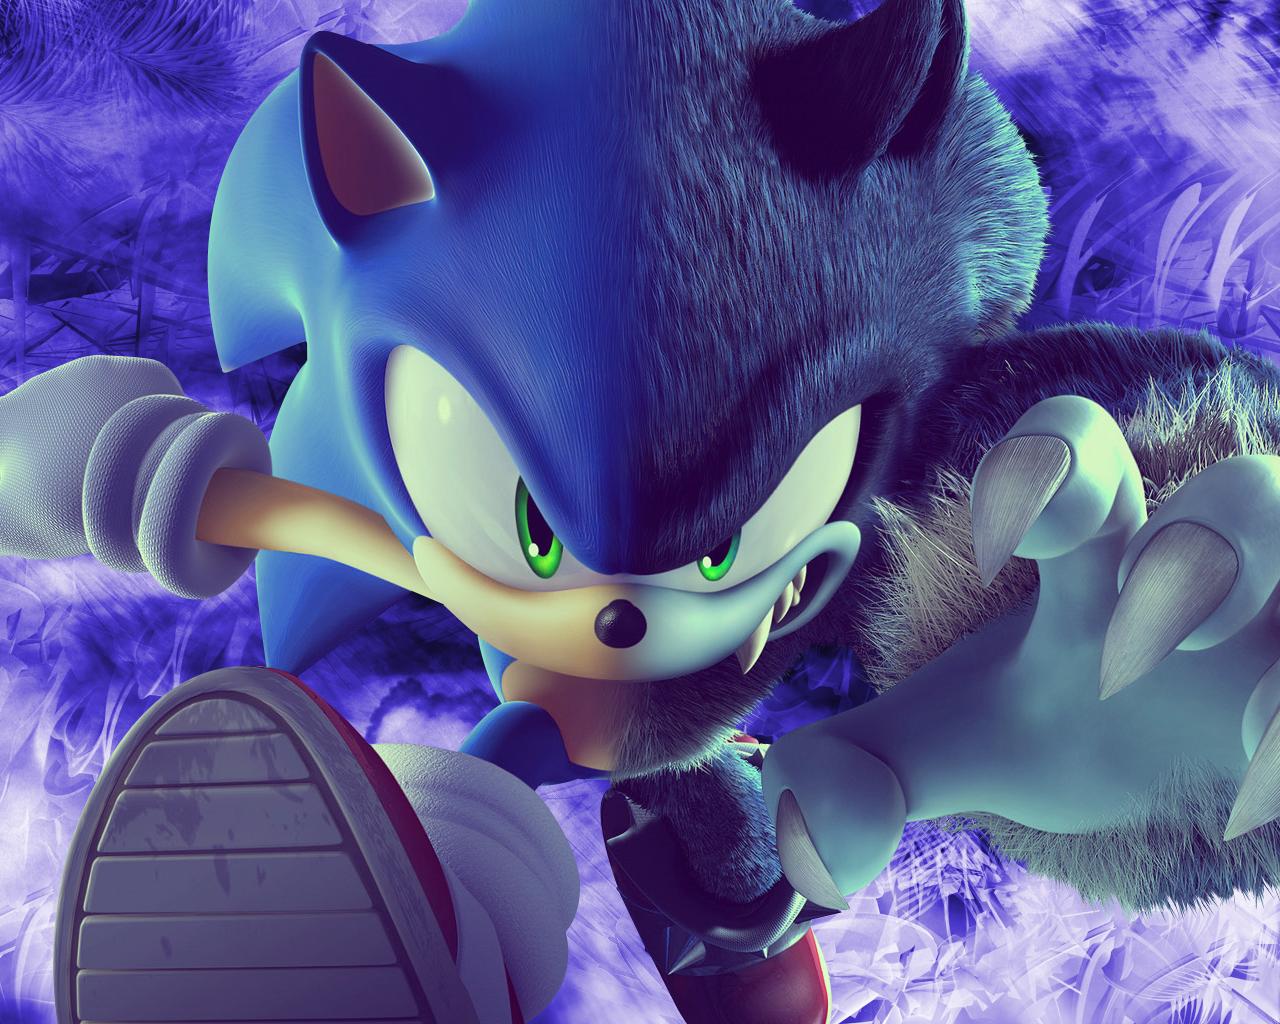 Sonic the Werehog Wallpaper - WallpaperSafari  Sonic